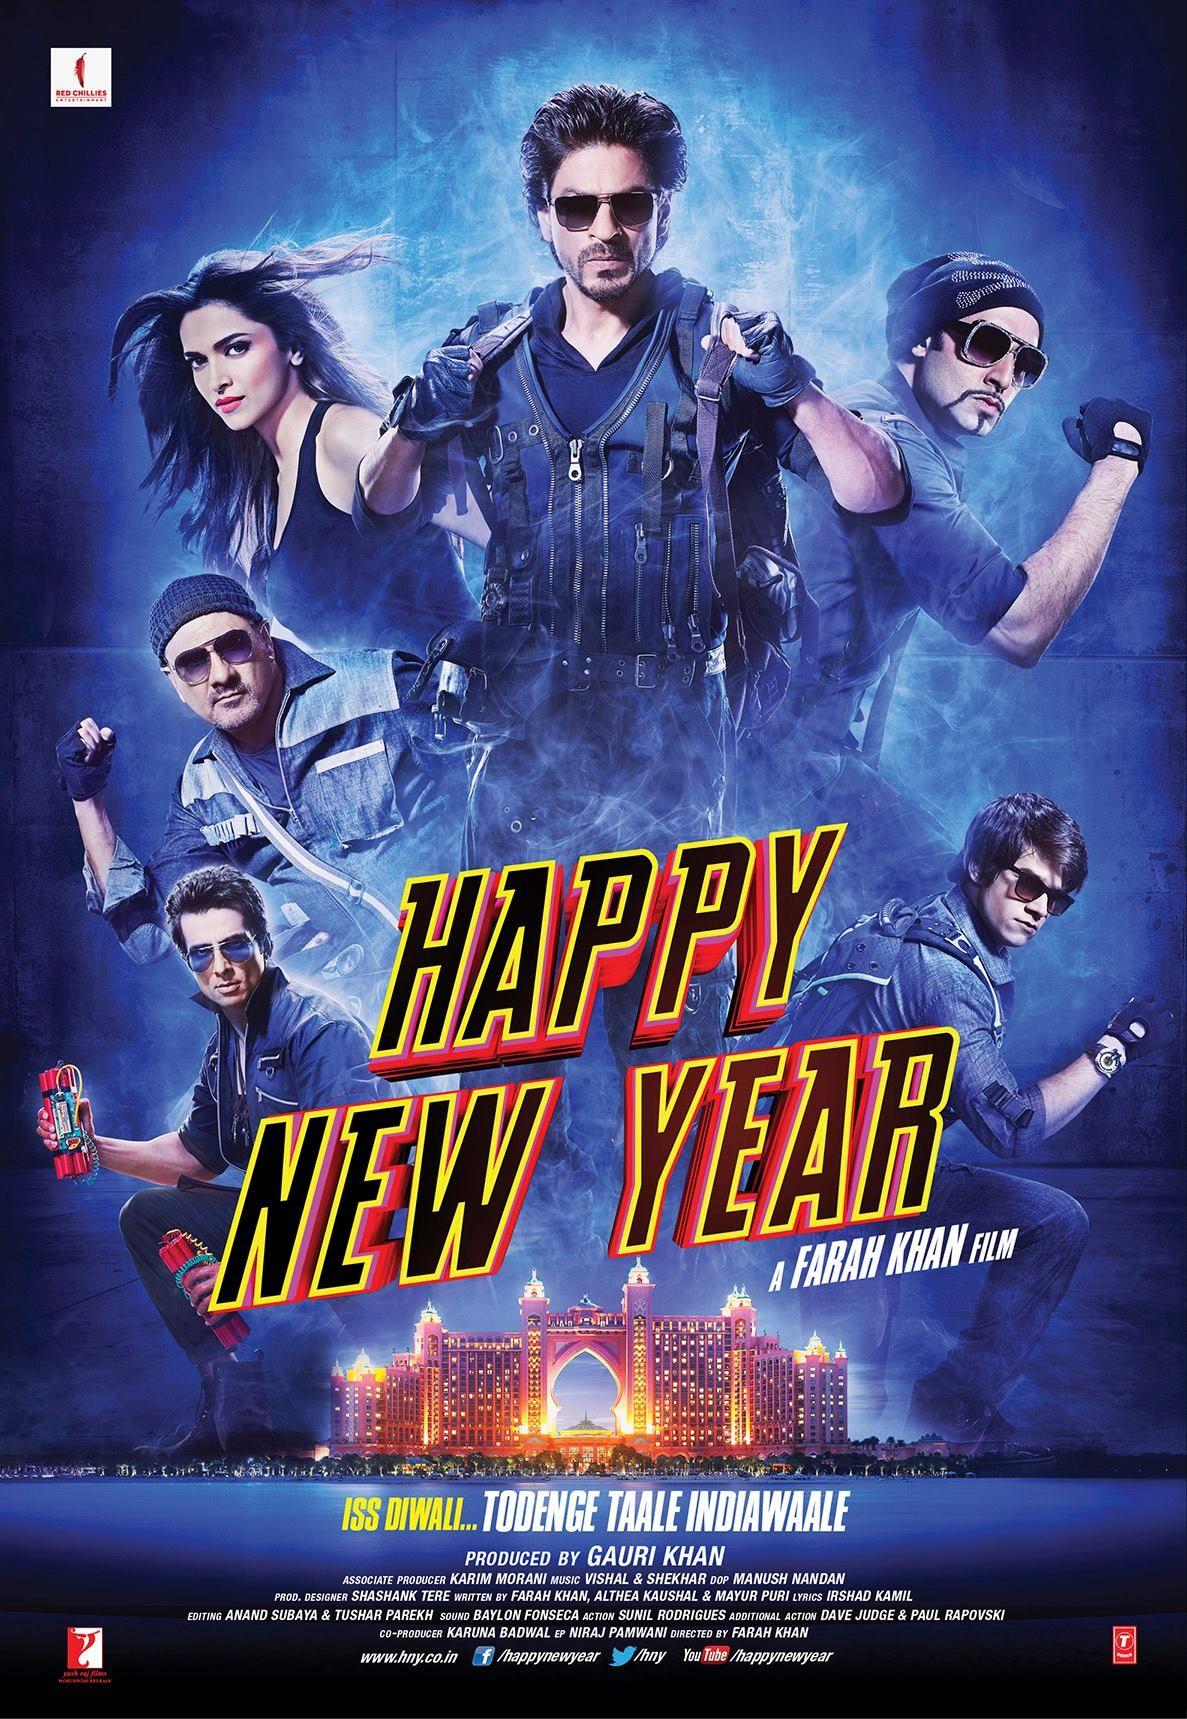 Shah Rukh Khan Deepika Padukone Staring Happy New Year Trailer